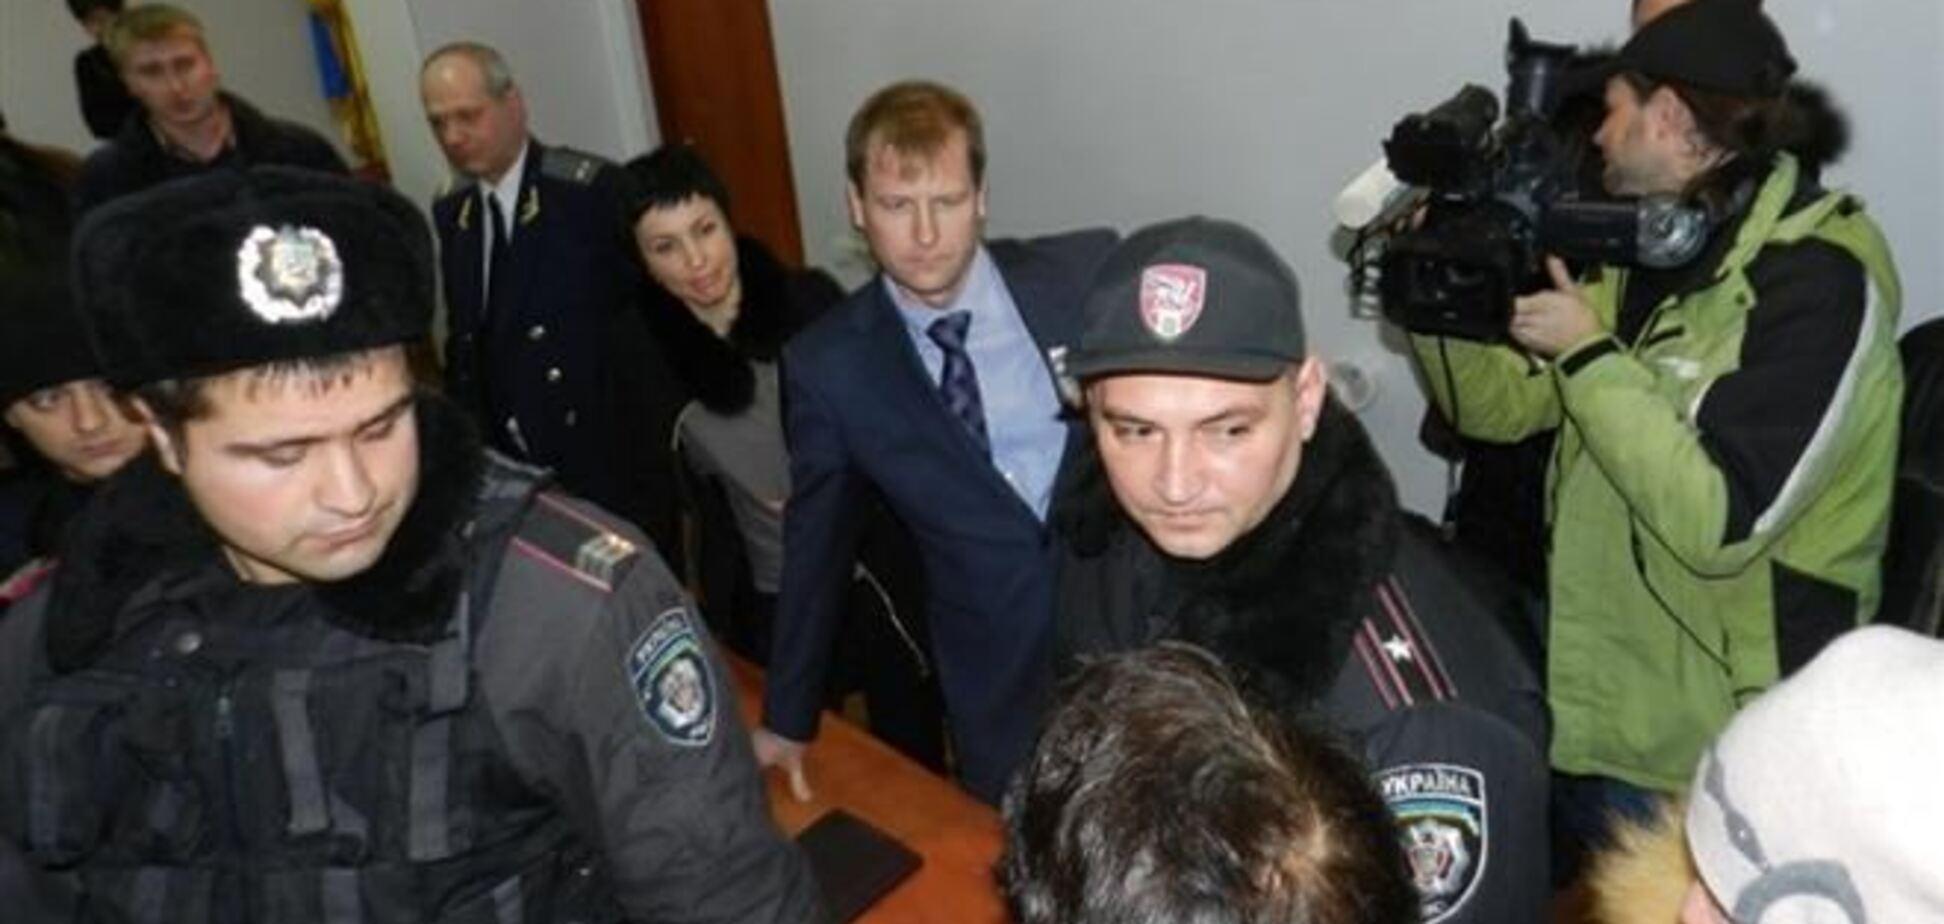 Невеста Дрижака прокляла Крашкову: недолго тебе, су*а, осталось